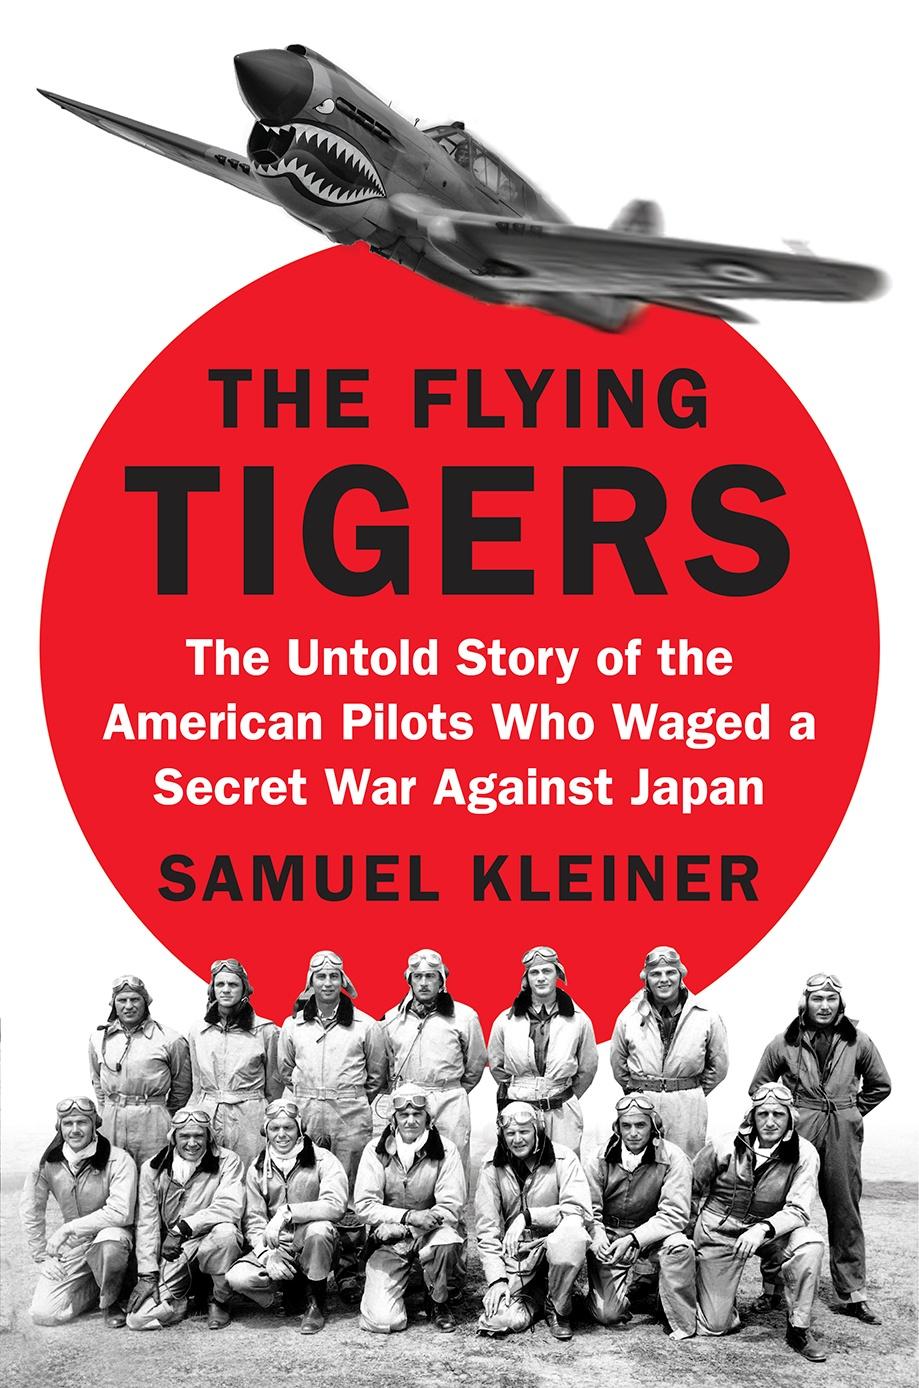 FlyingTigers_Author